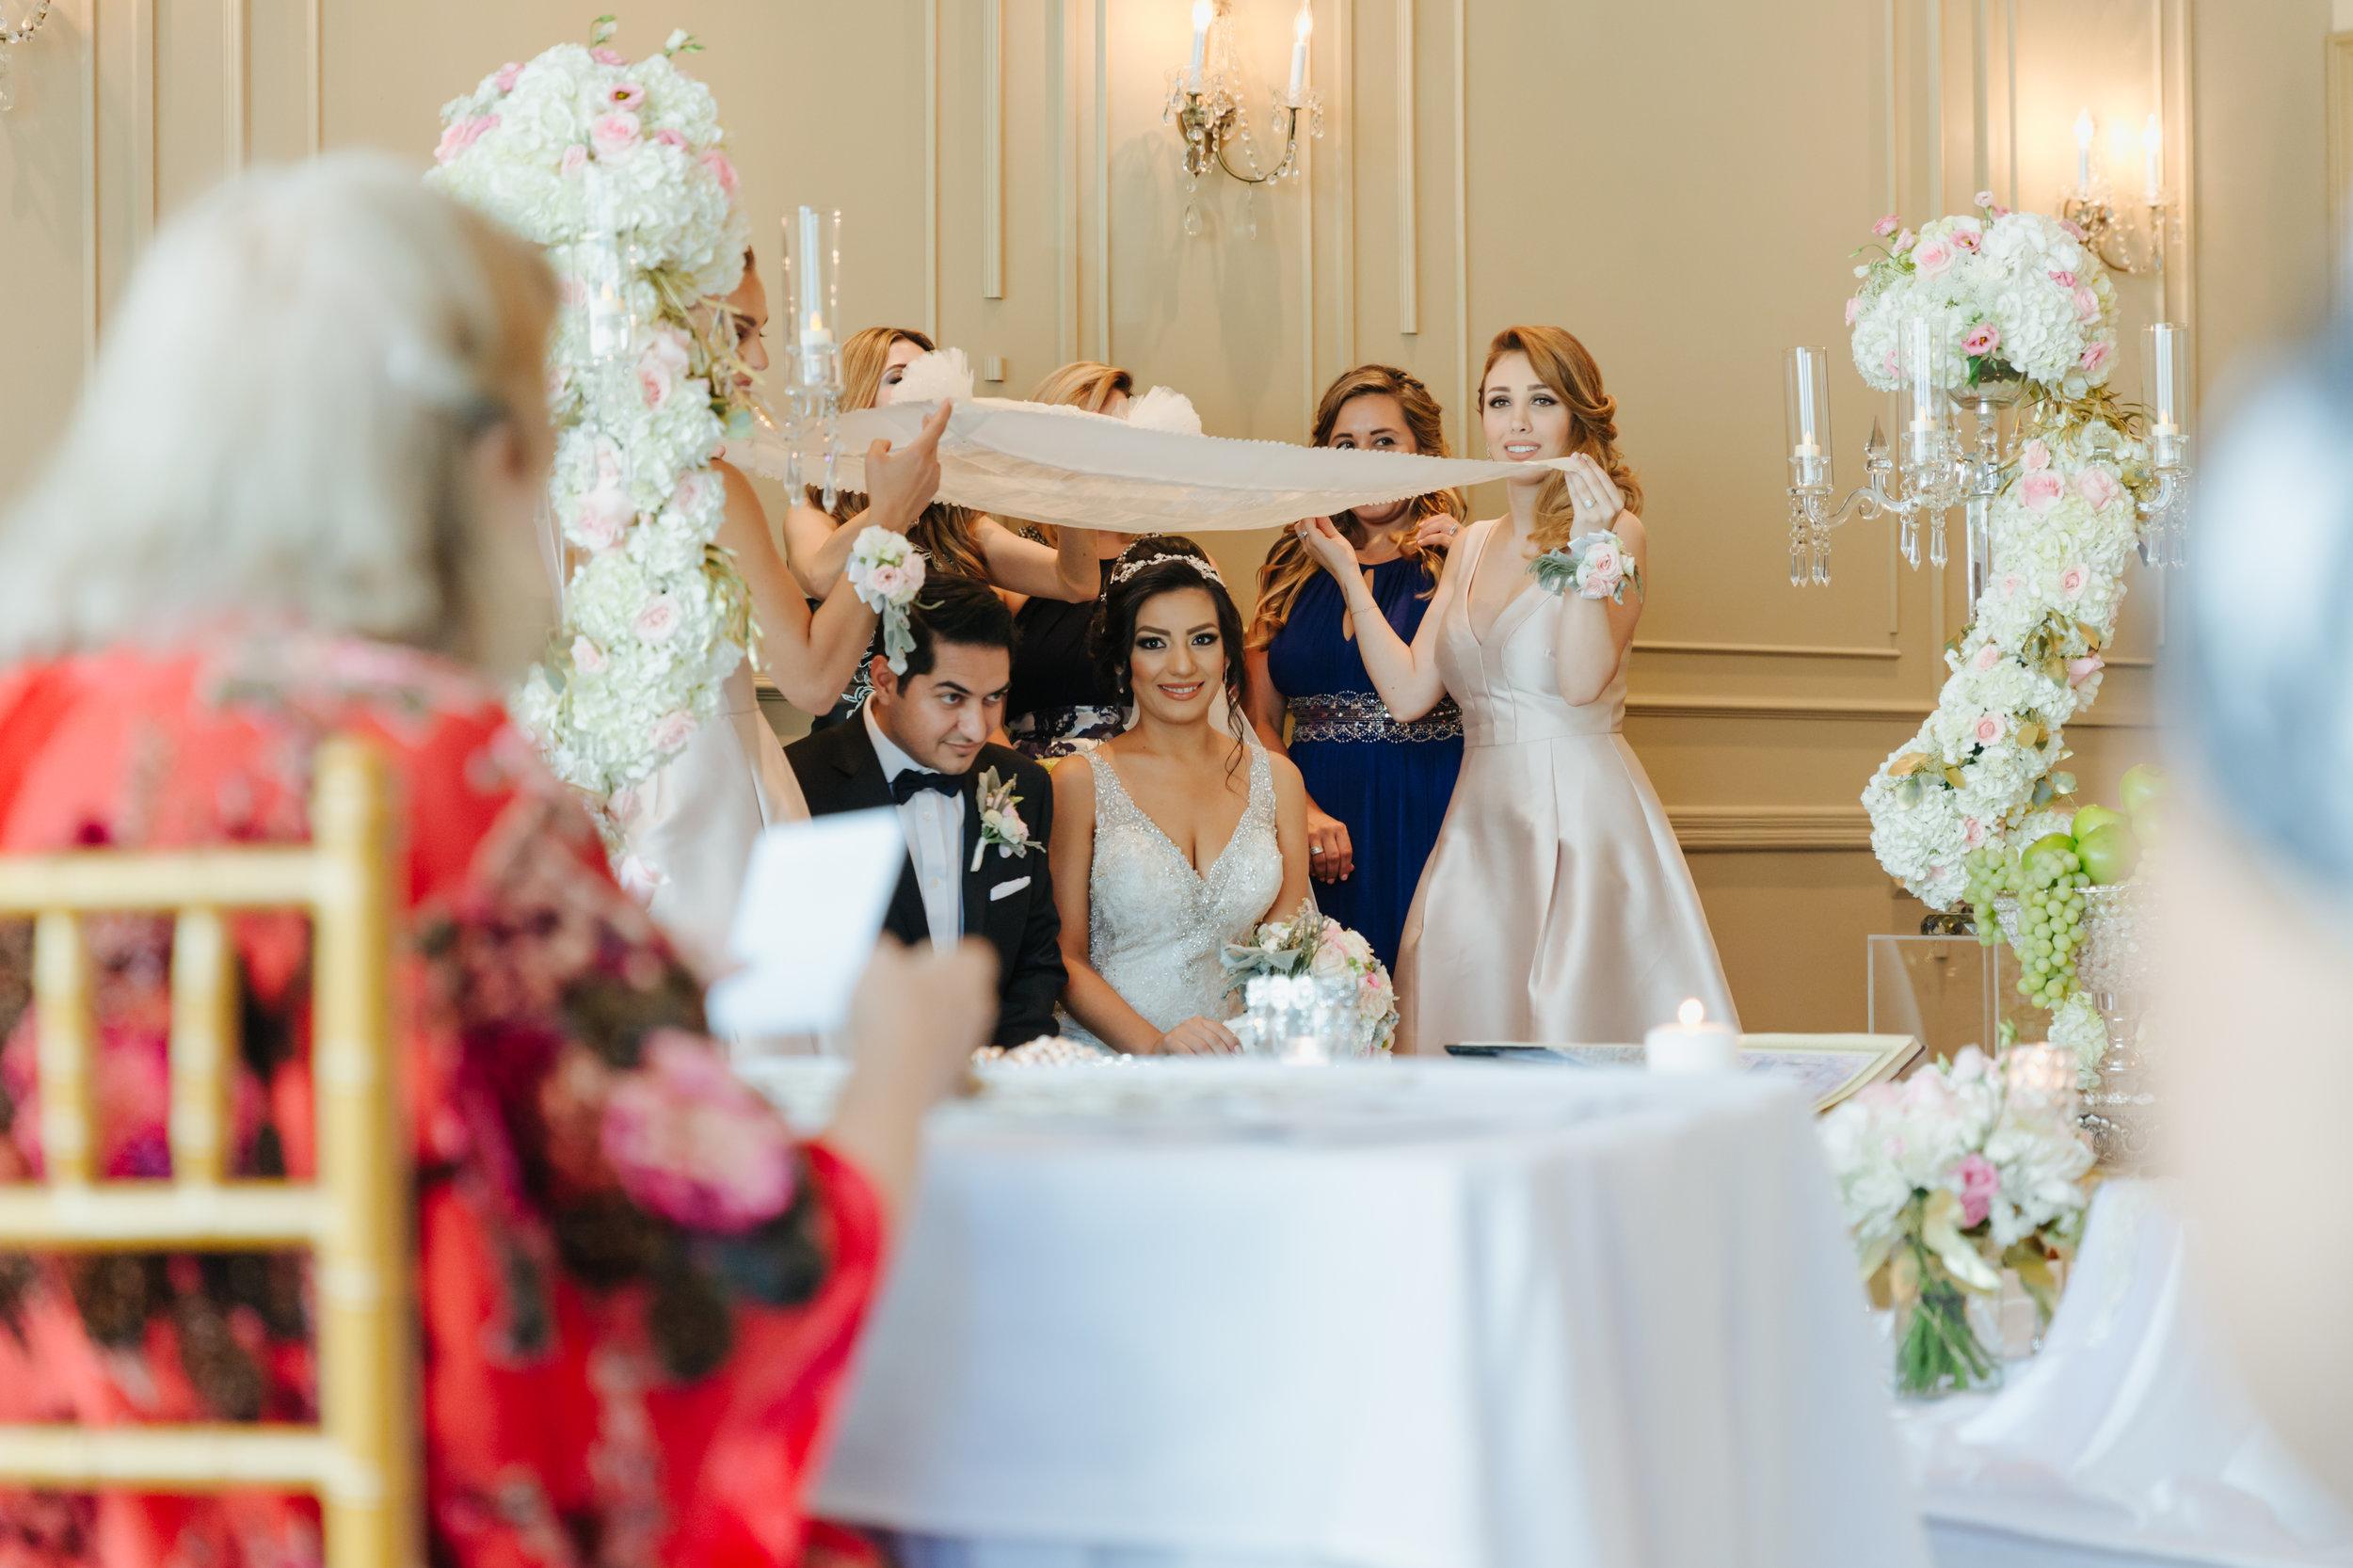 herastudios_wedding_azin_farhad_collector_package-246.jpg